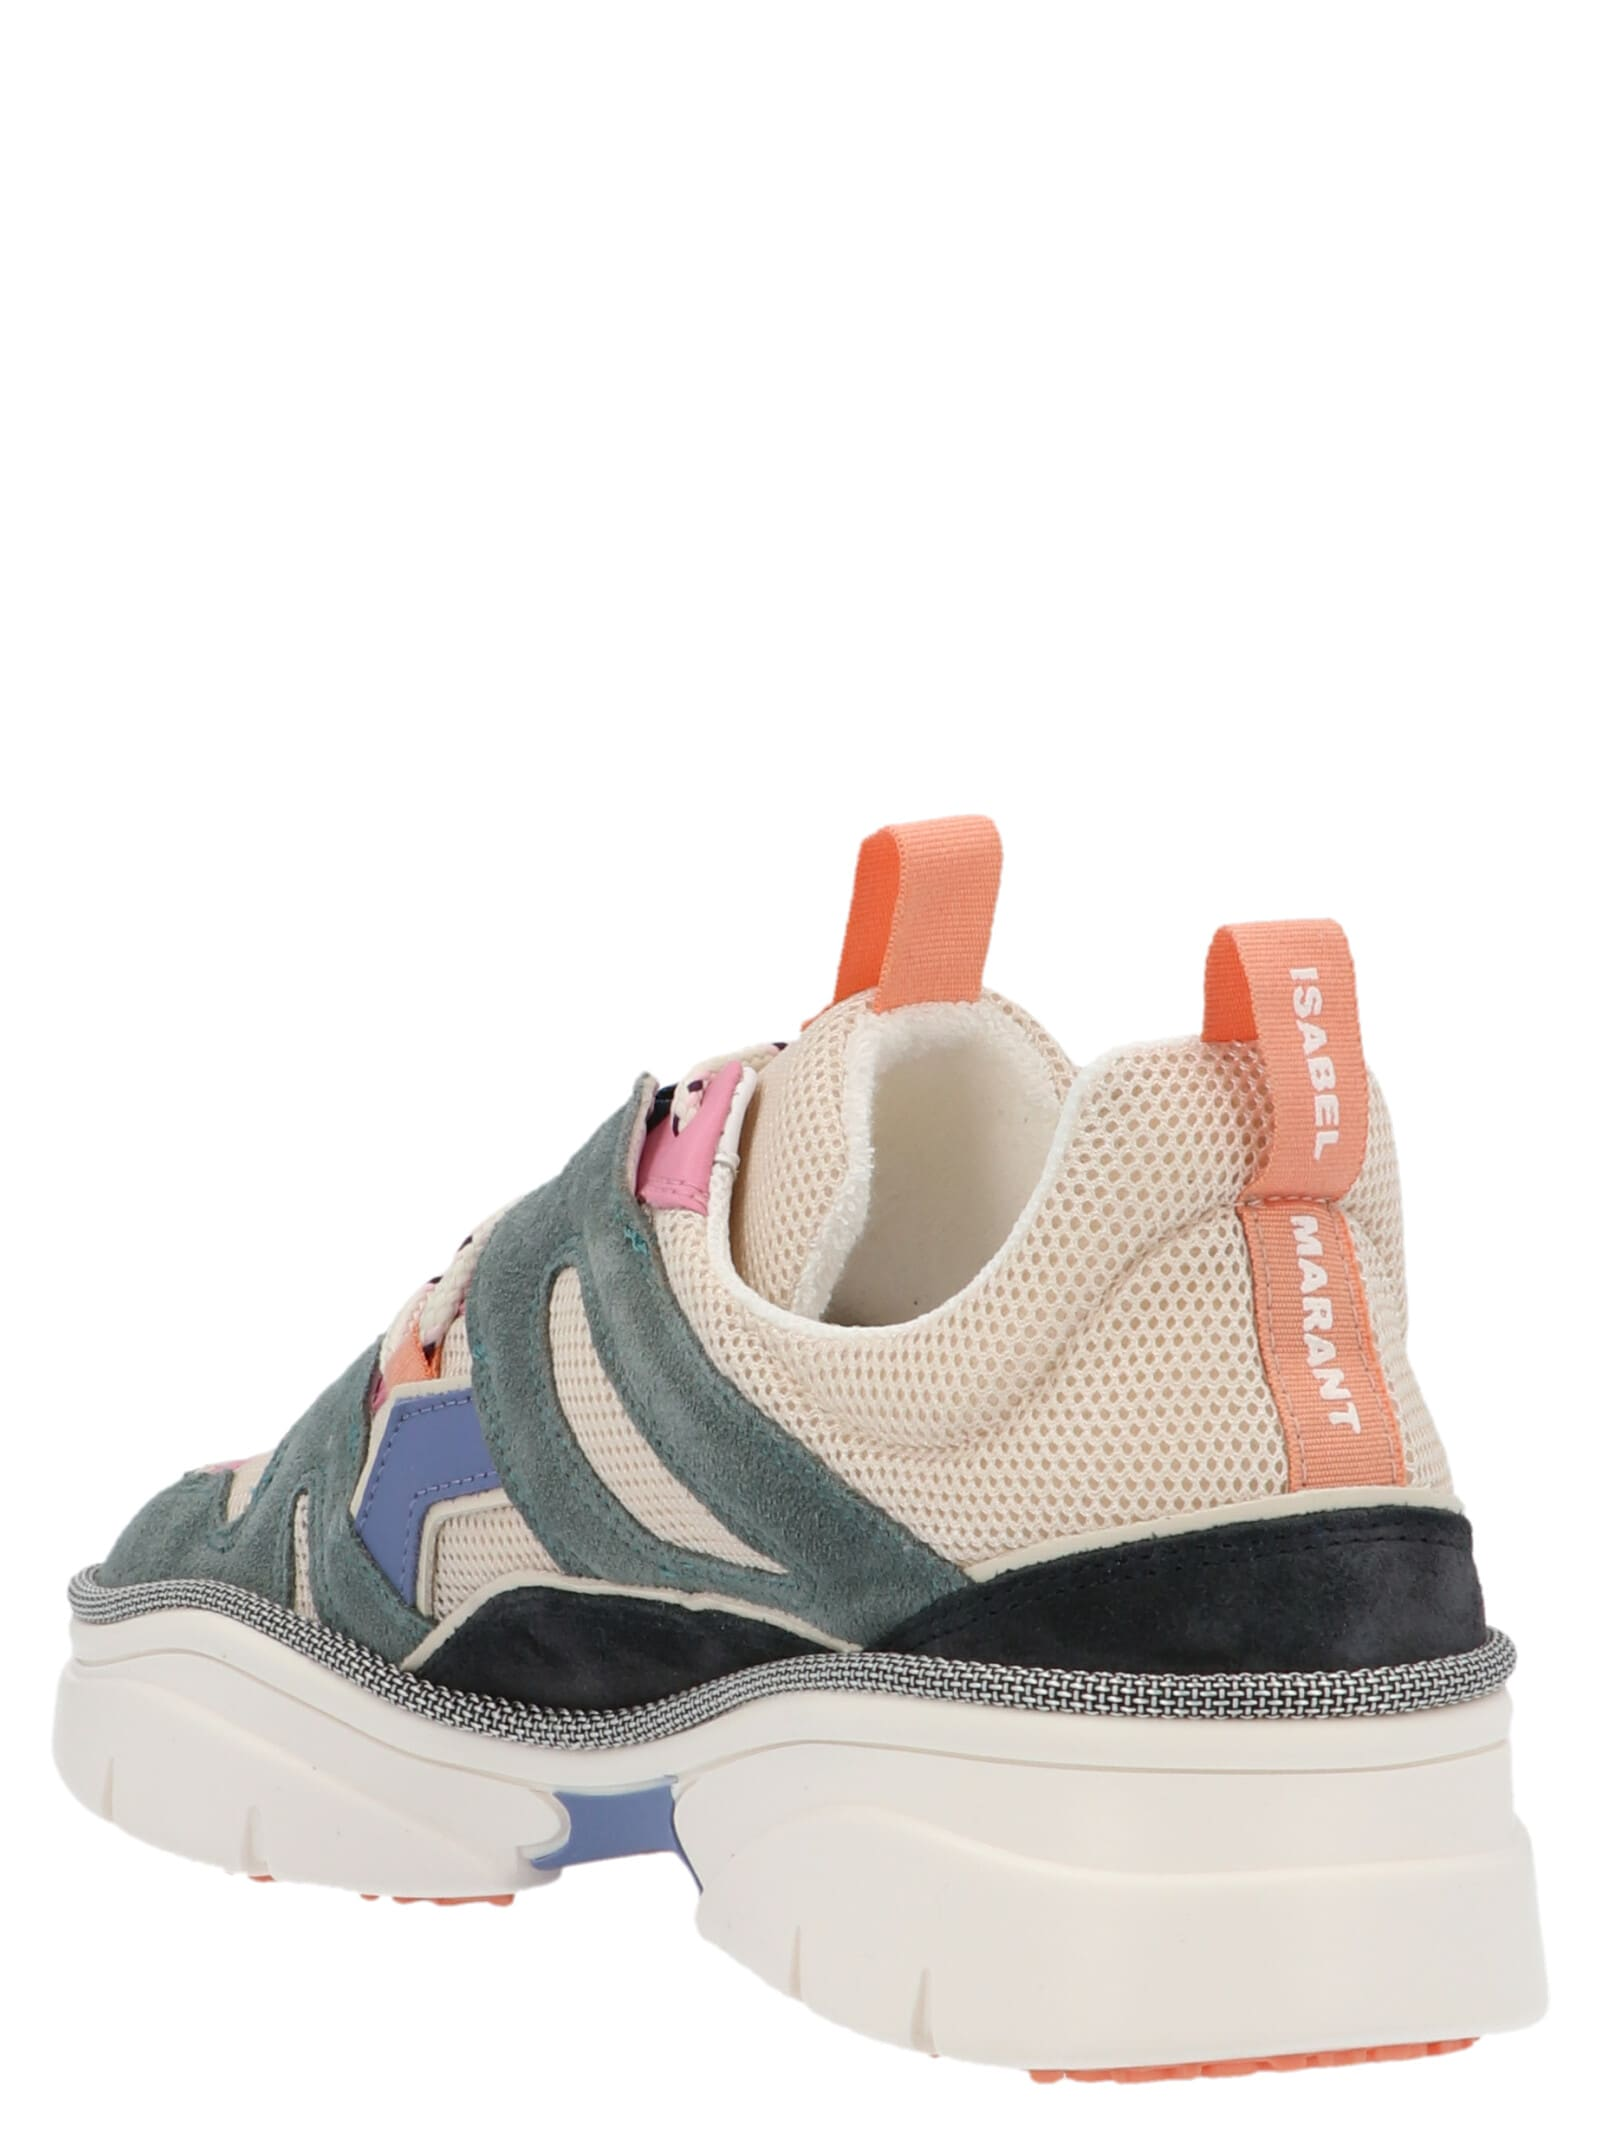 Isabel Marant Sneakers   italist